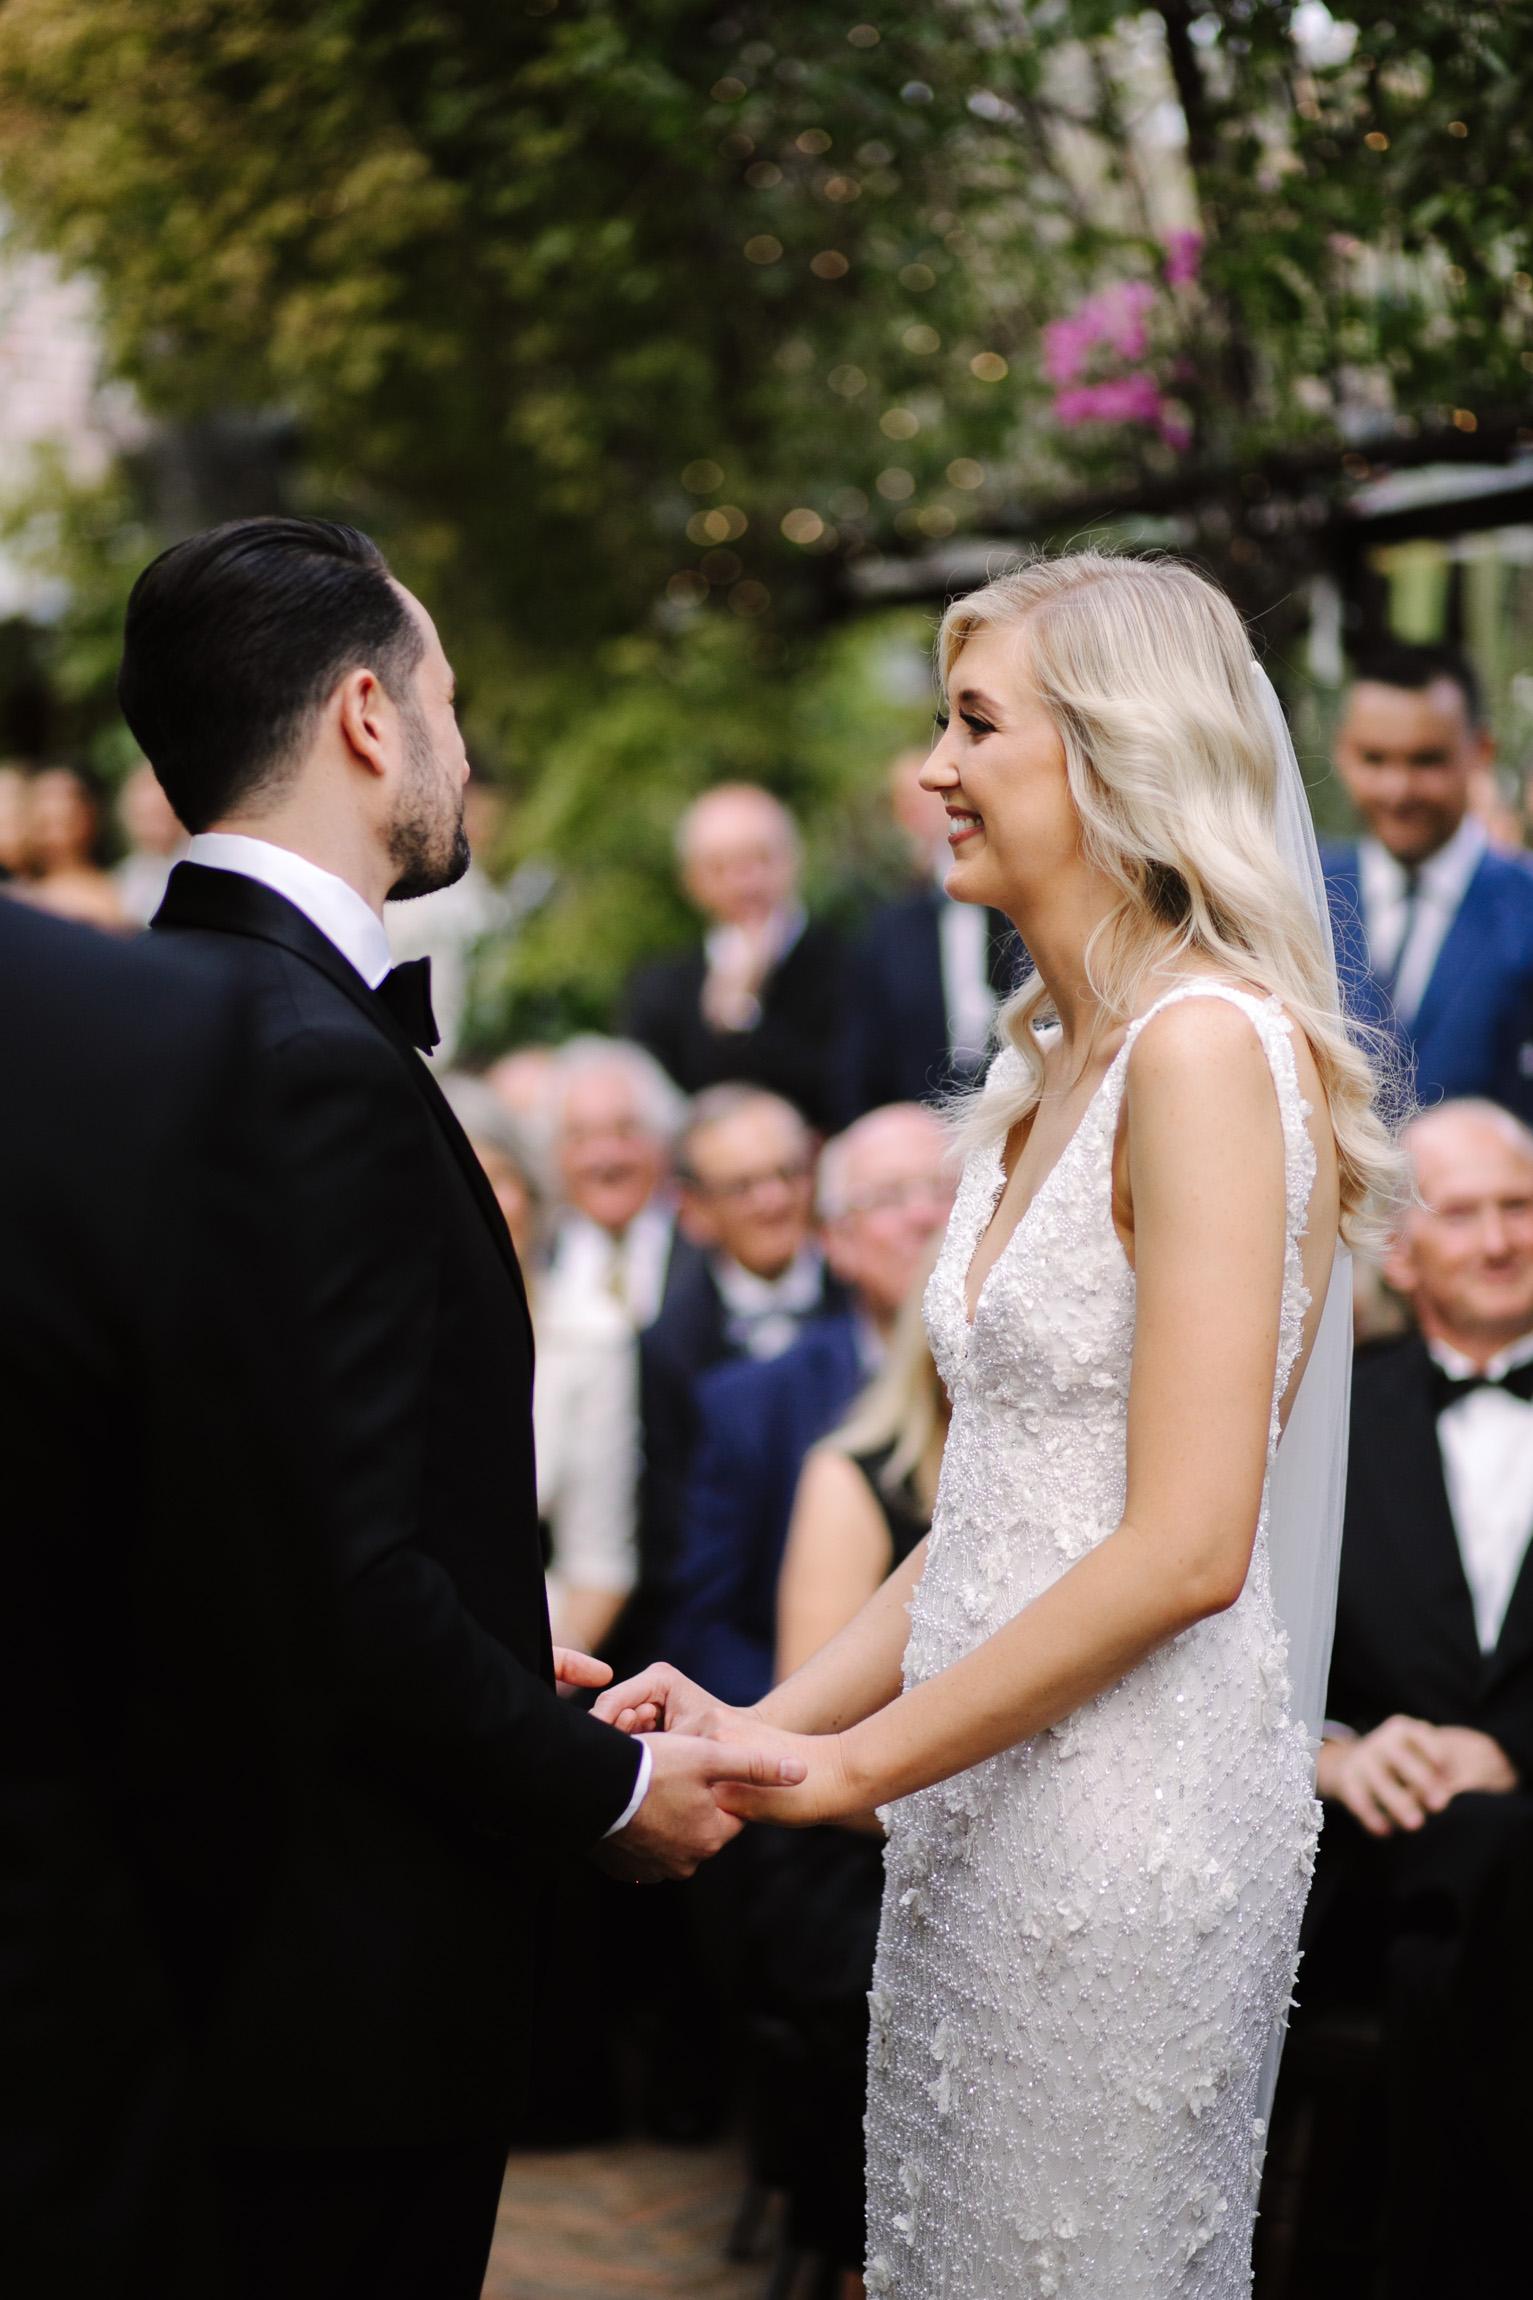 180223_justinaaron_wedding_charlotte_david_h-120.jpg